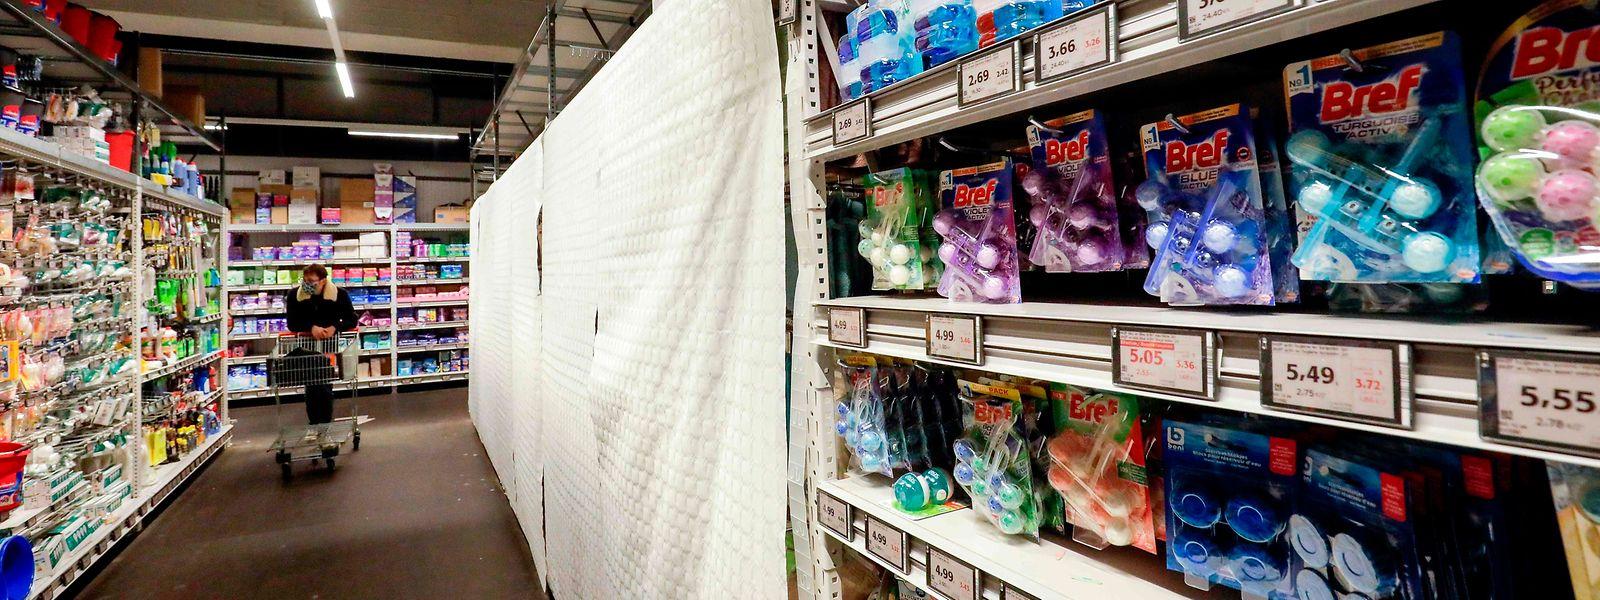 Les supermarchés devront rendre inaccessibles les rayons des produits non essentiels.